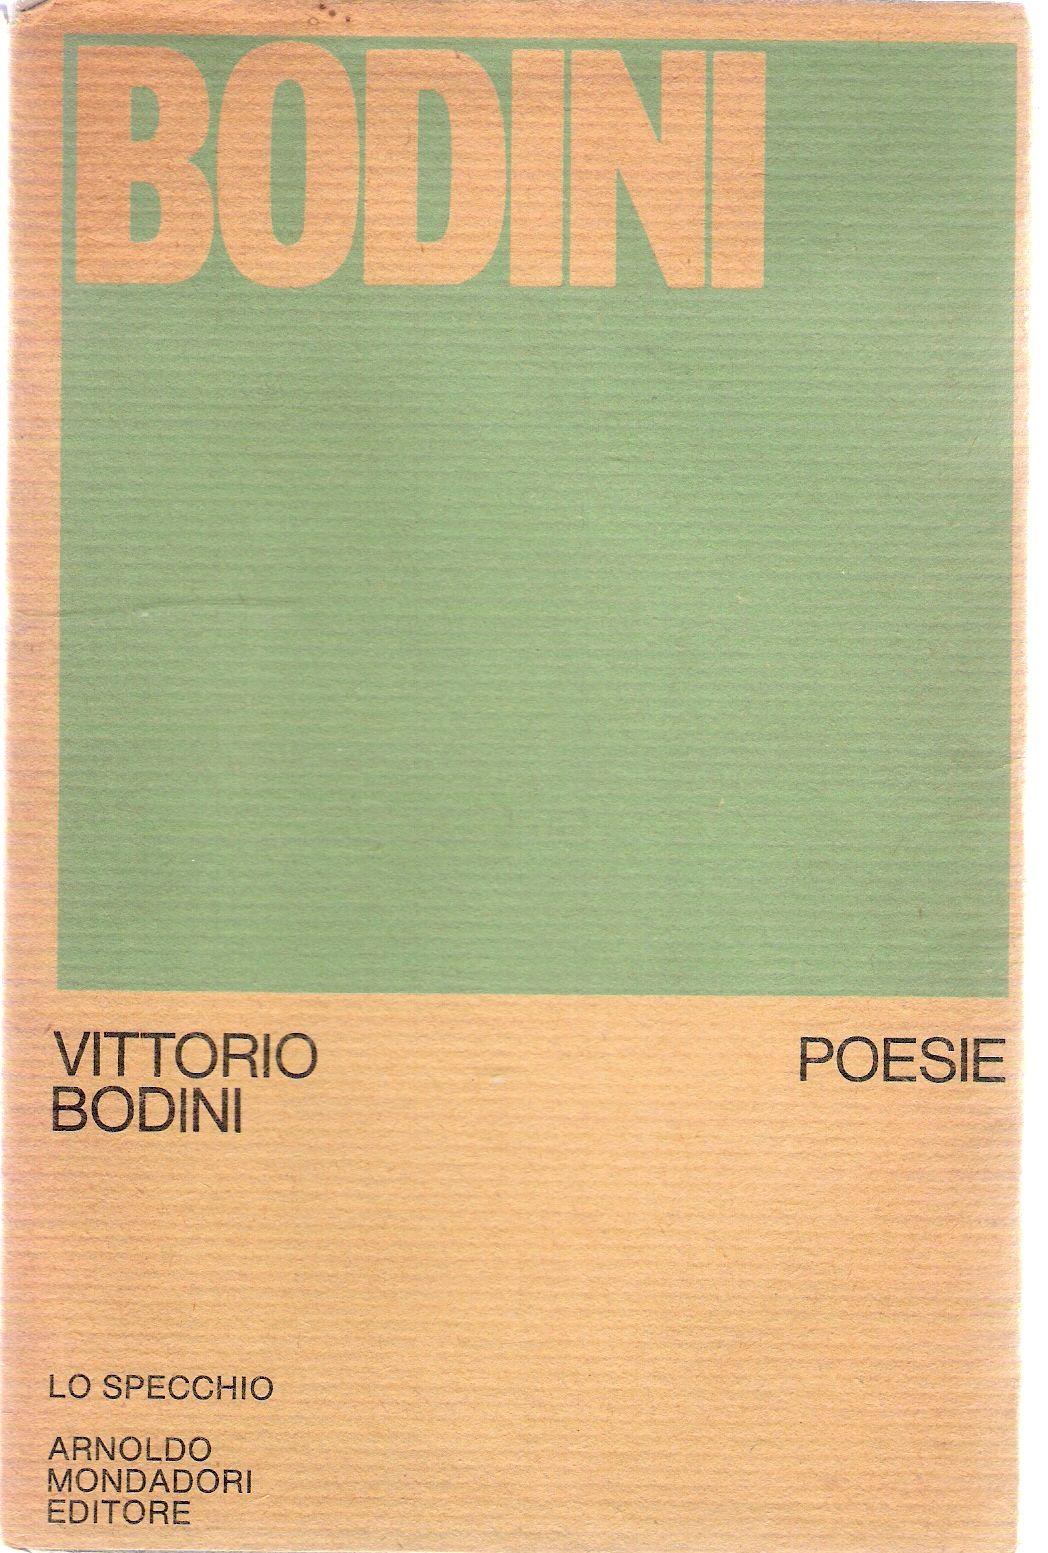 'Bodiniana' anno cento (1914-2014)